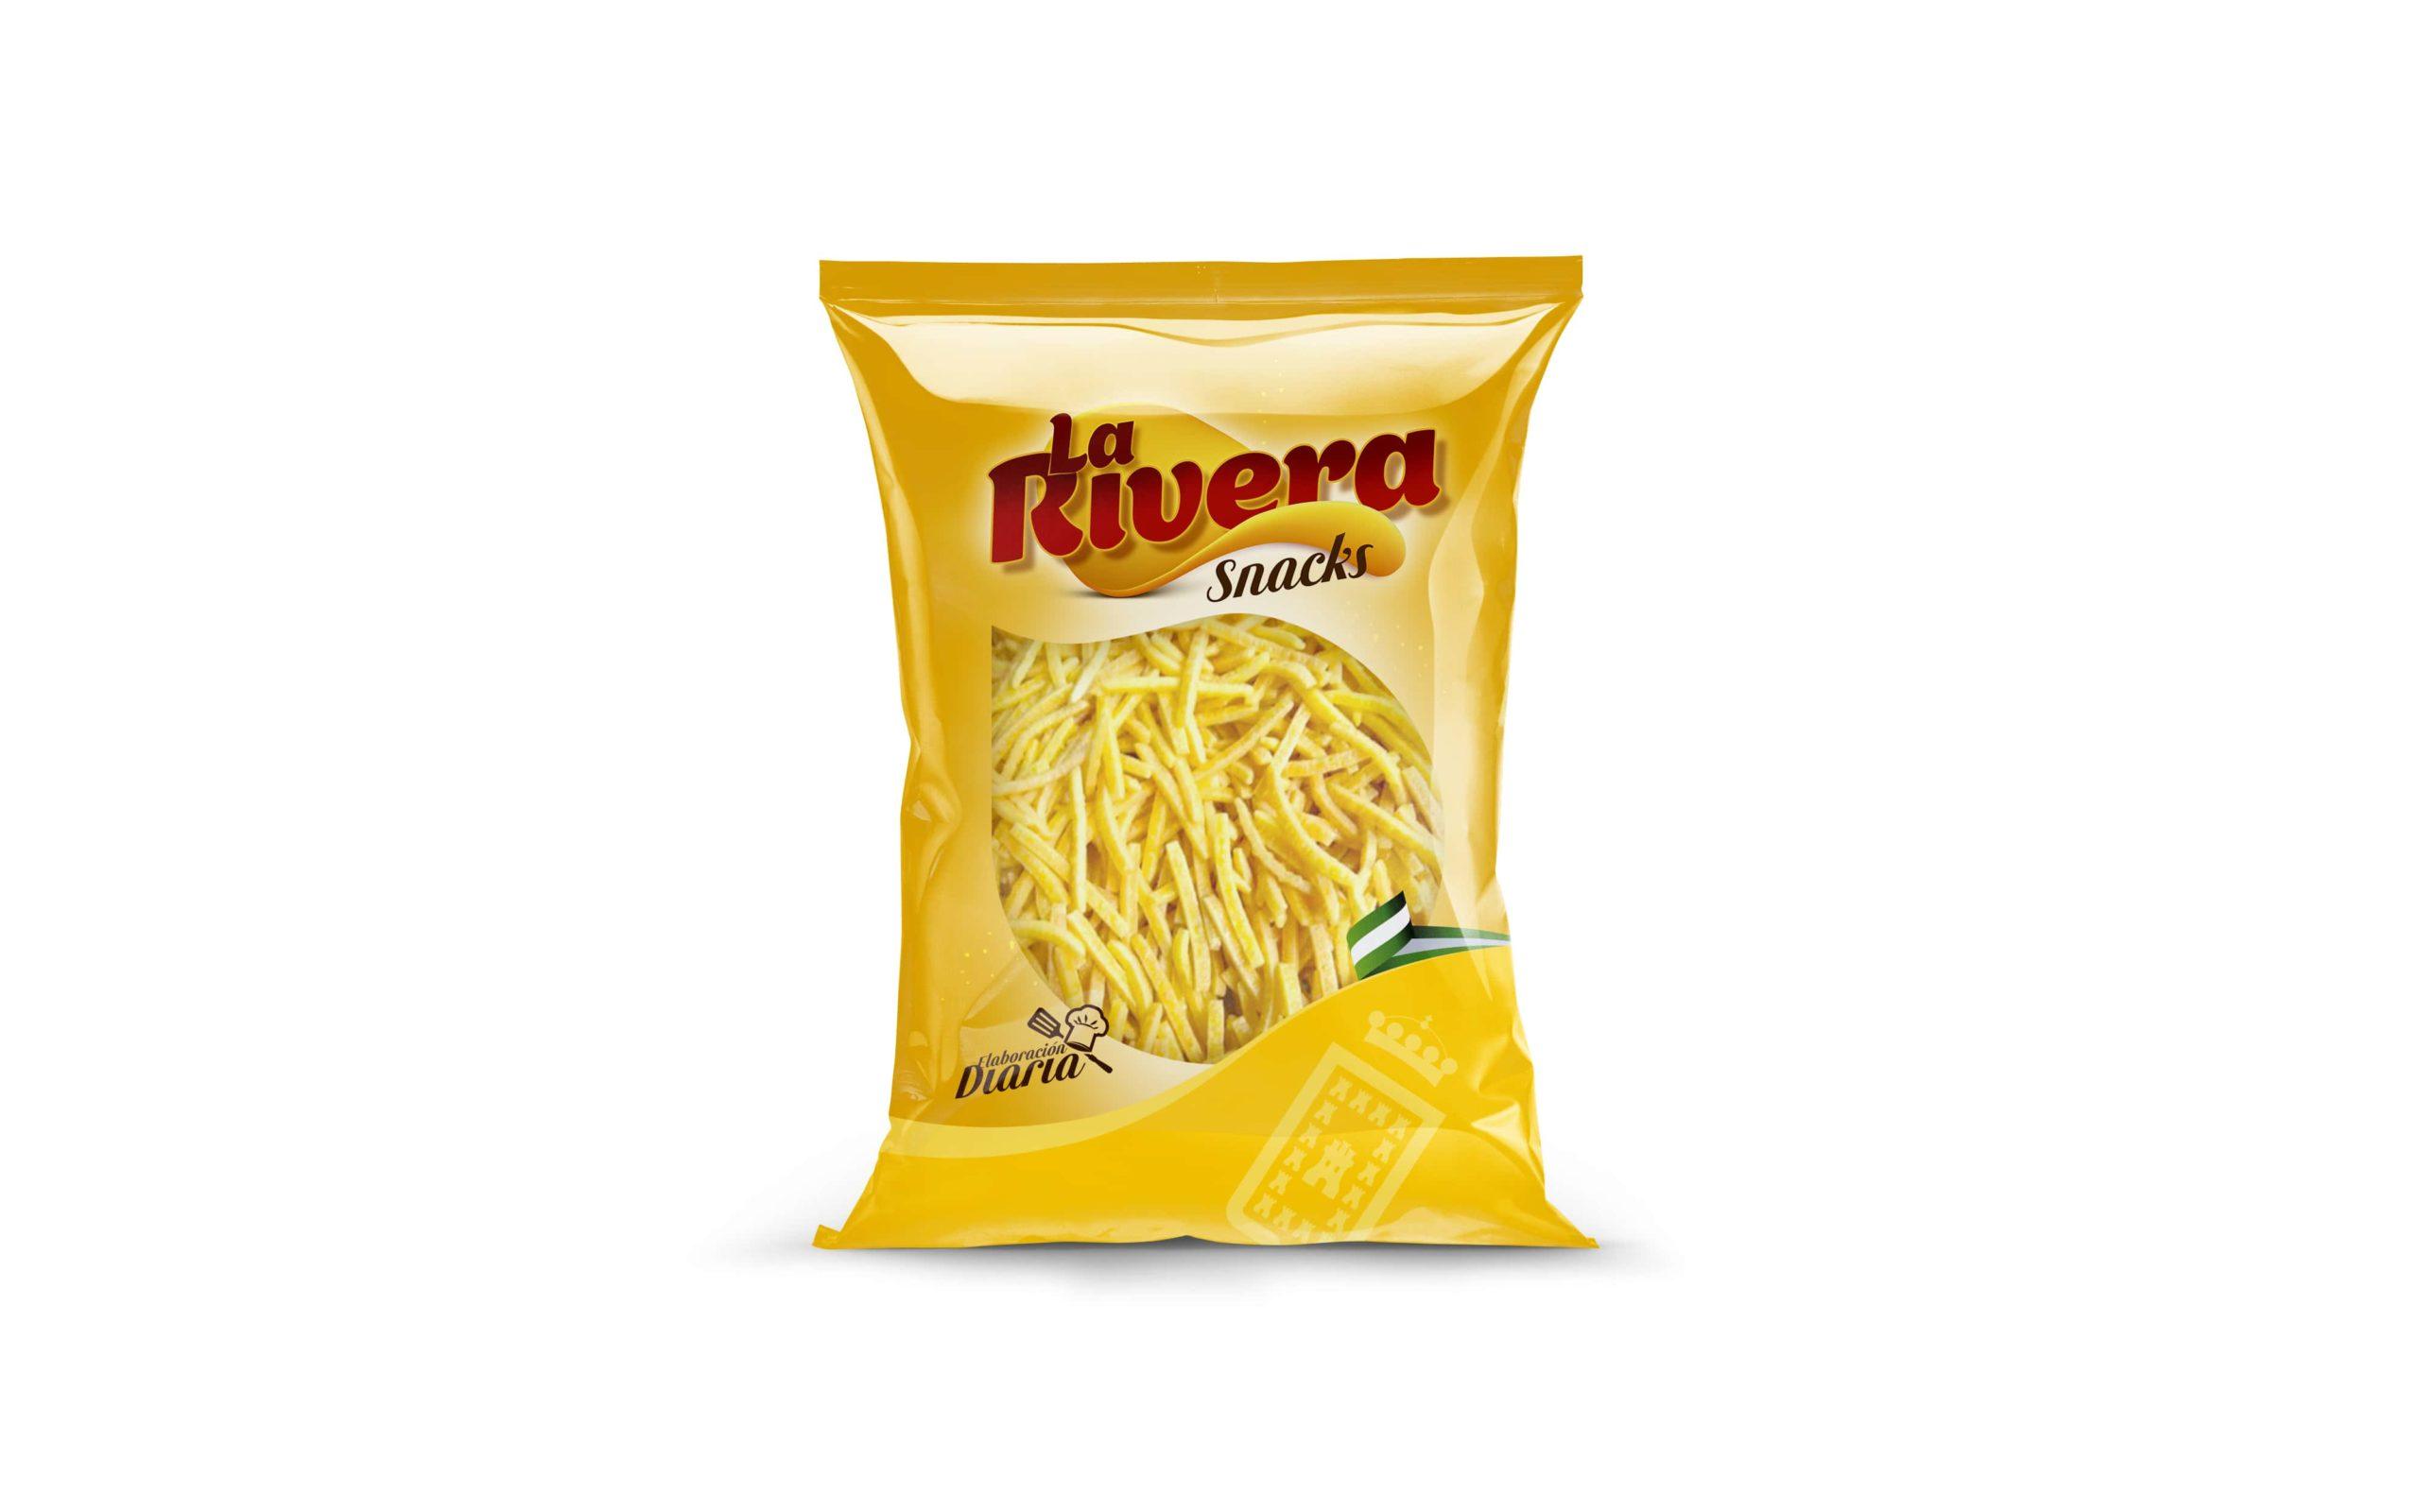 diseno-packaging-la-rivera-pajitas-min